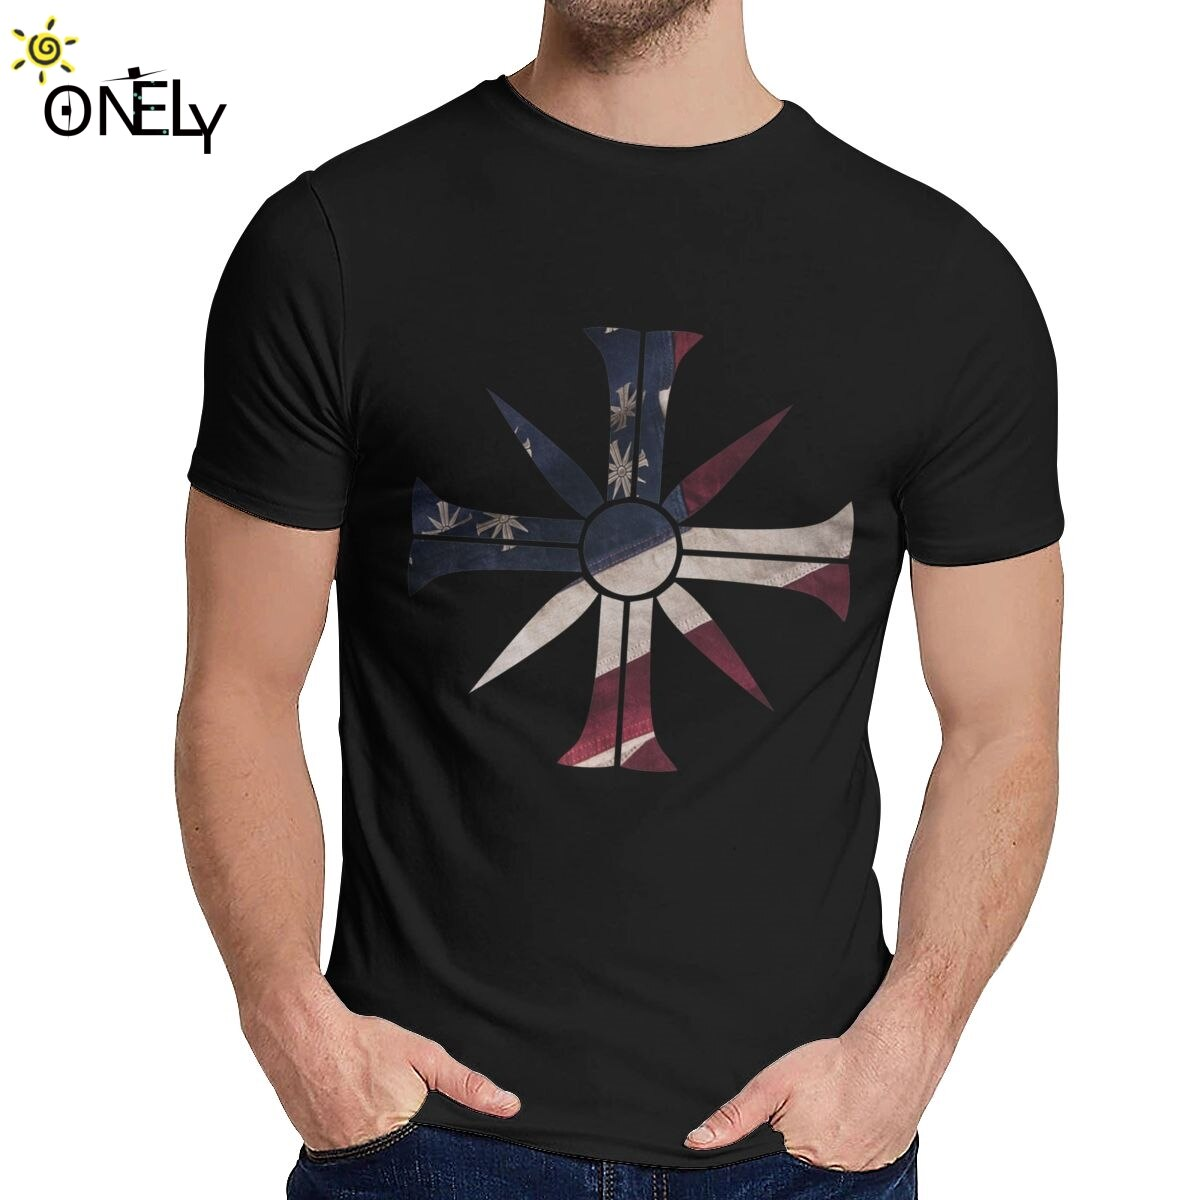 Camiseta para hombre, juego Far Cry 5, algodón de calidad, Casual, camiseta de Hip-Hop con cuello redondo para hombre